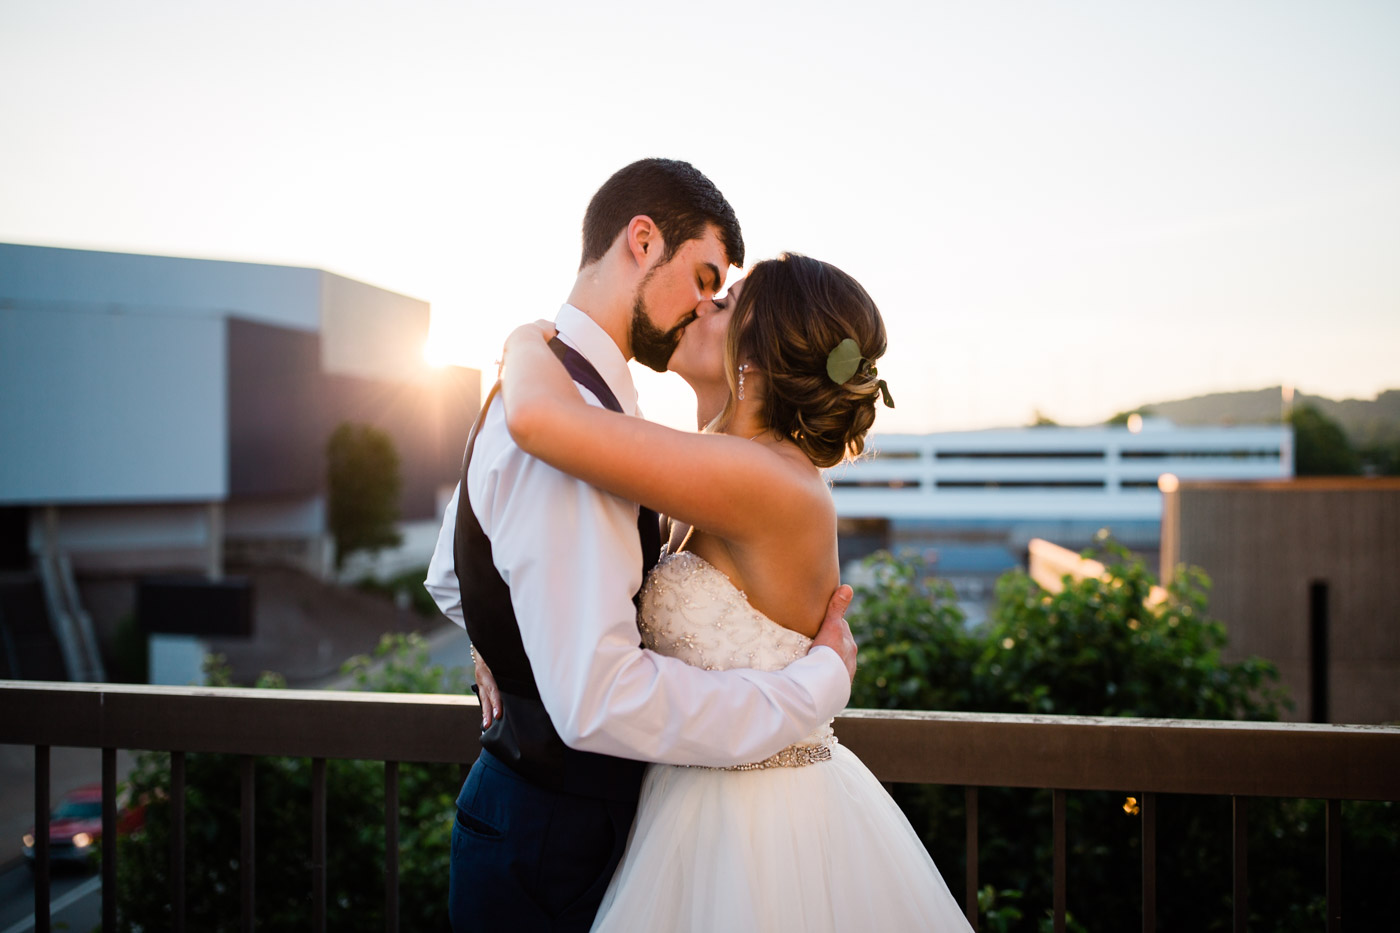 Sunset photos at an urban wedding in Charlottesville, Virginia